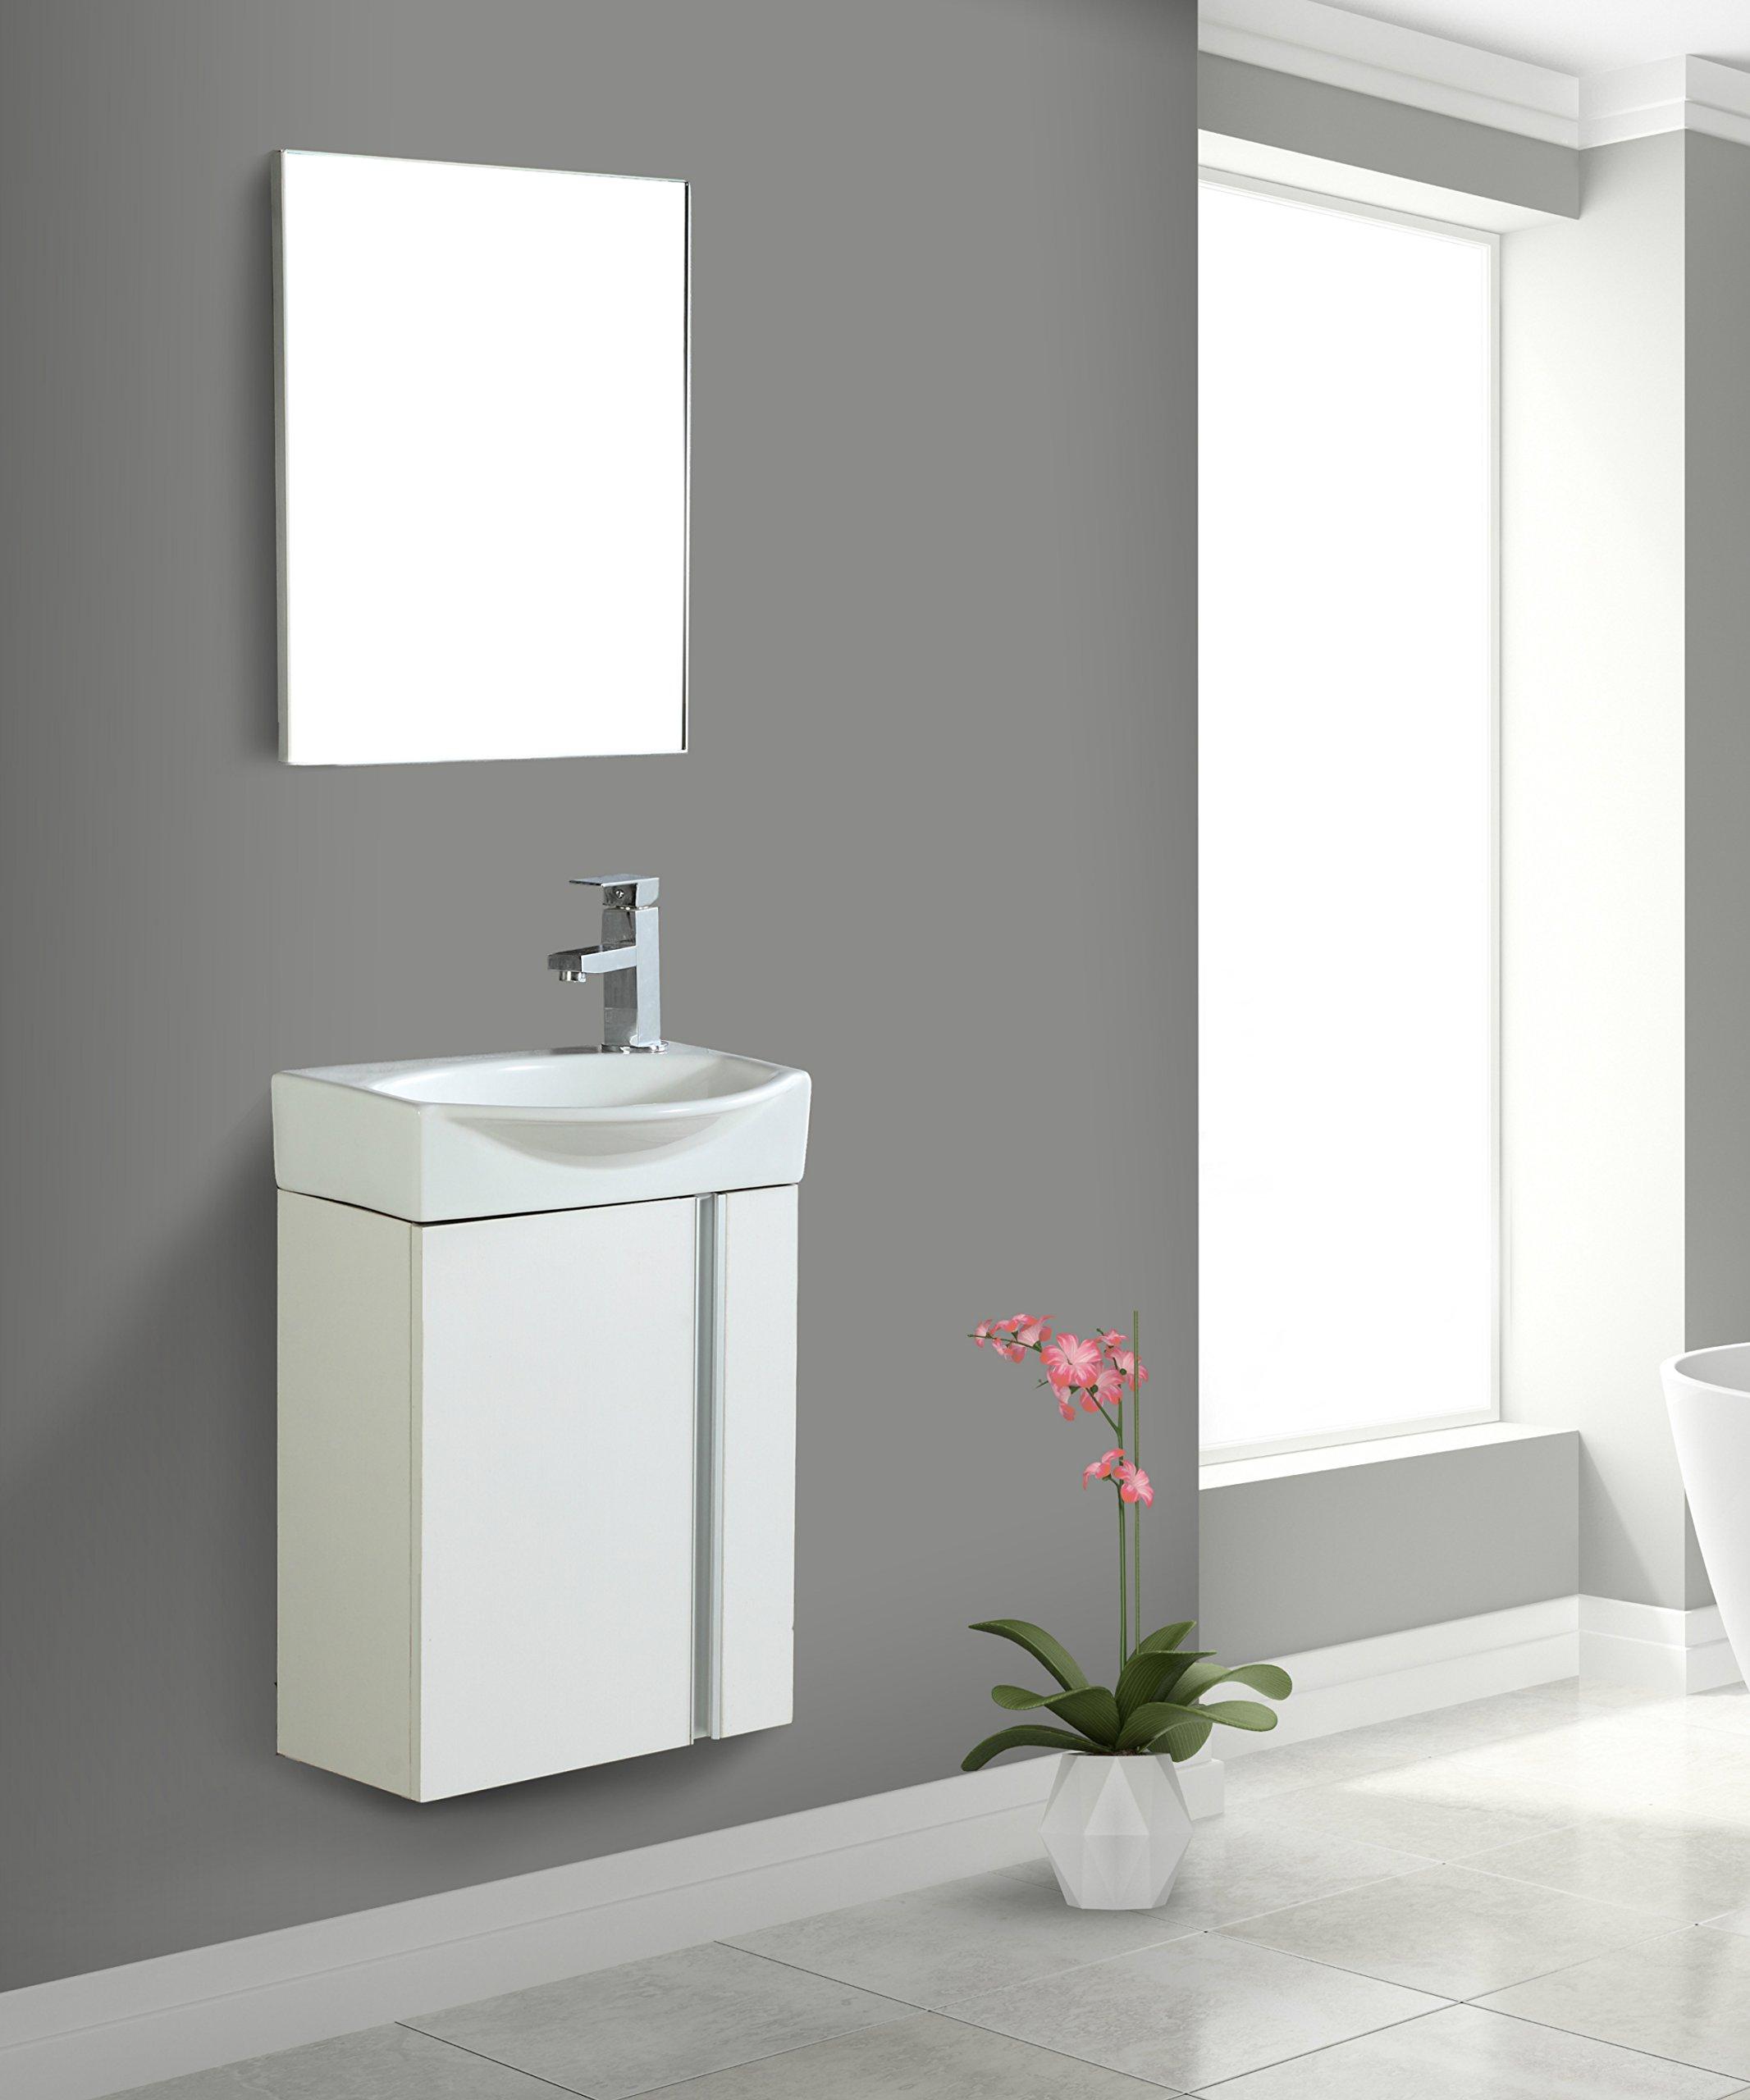 Cheap Sink Fixtures, find Sink Fixtures deals on line at Alibaba.com